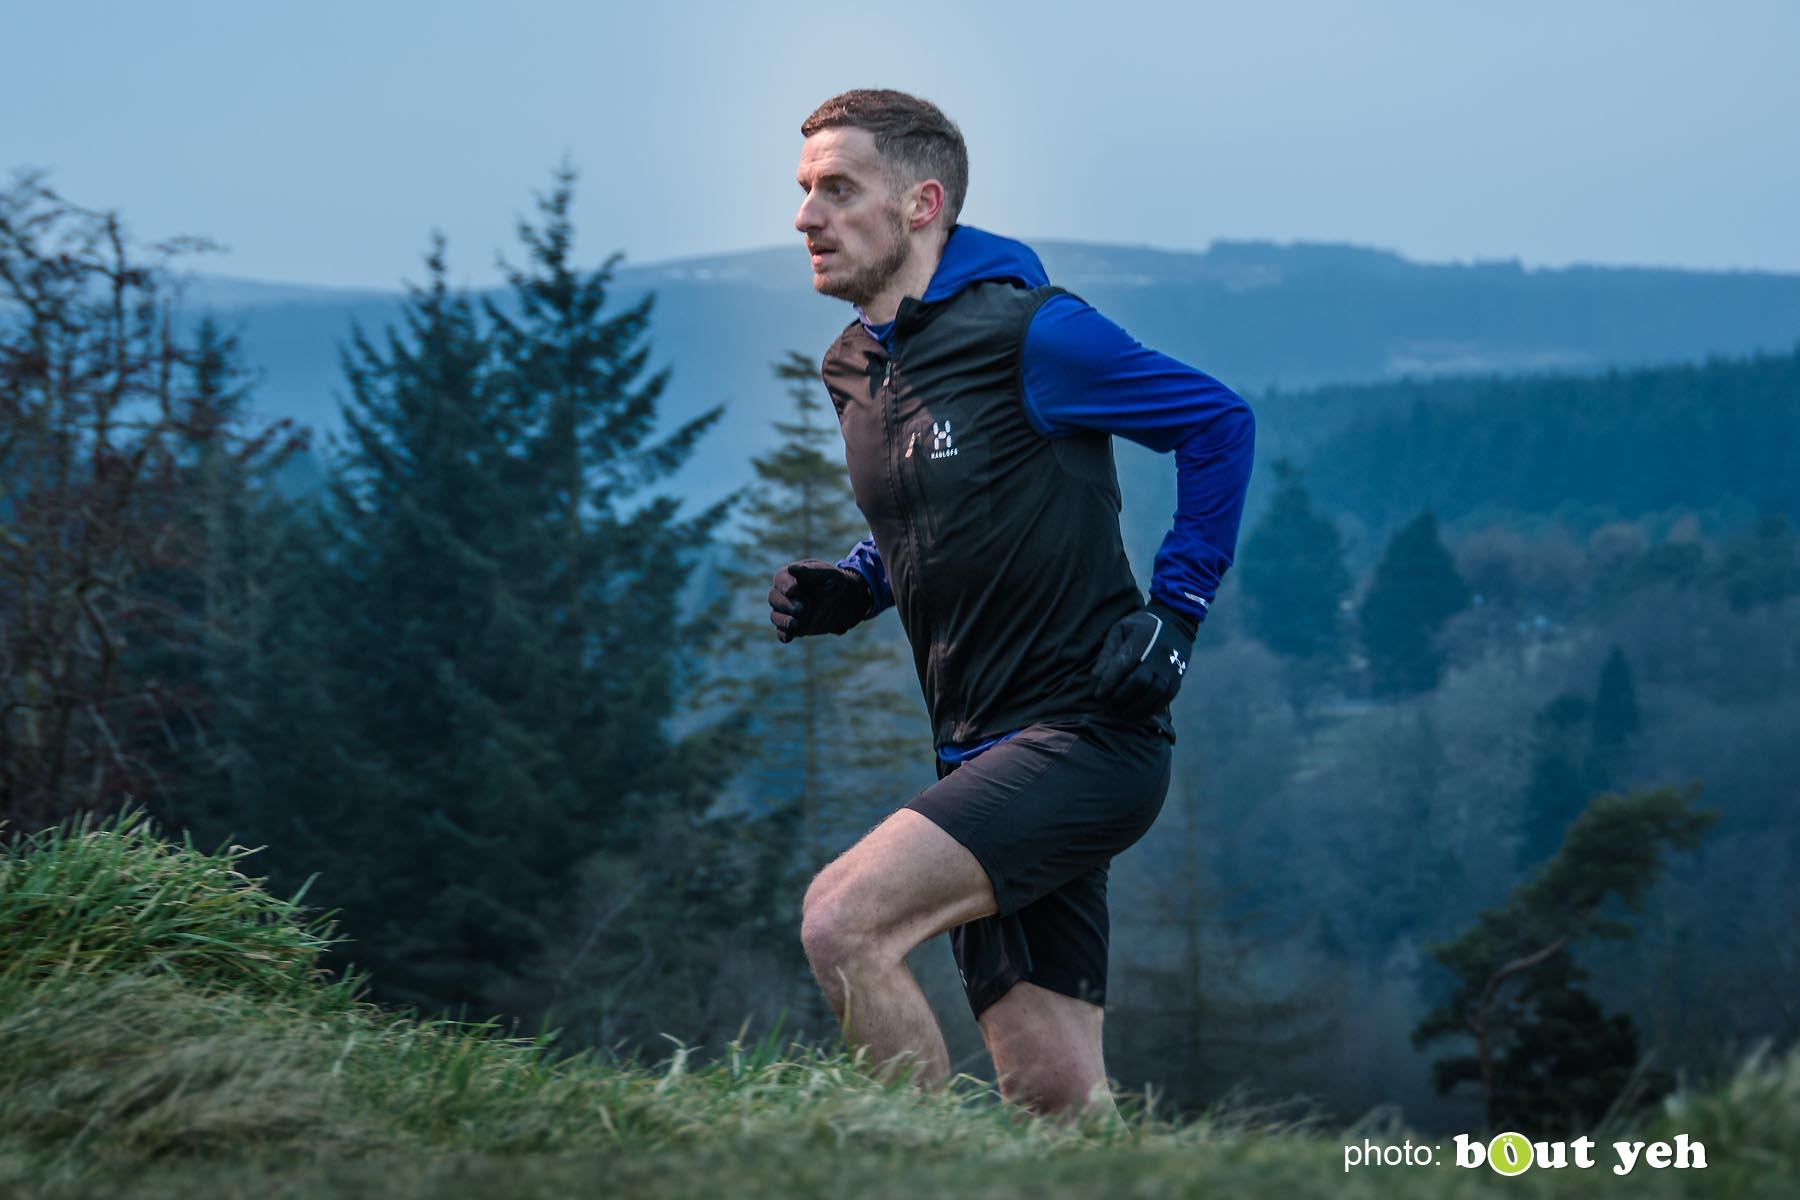 Tim, of Ballymena Runners, at Glenariff Forest, Northern Ireland - photo 0619.